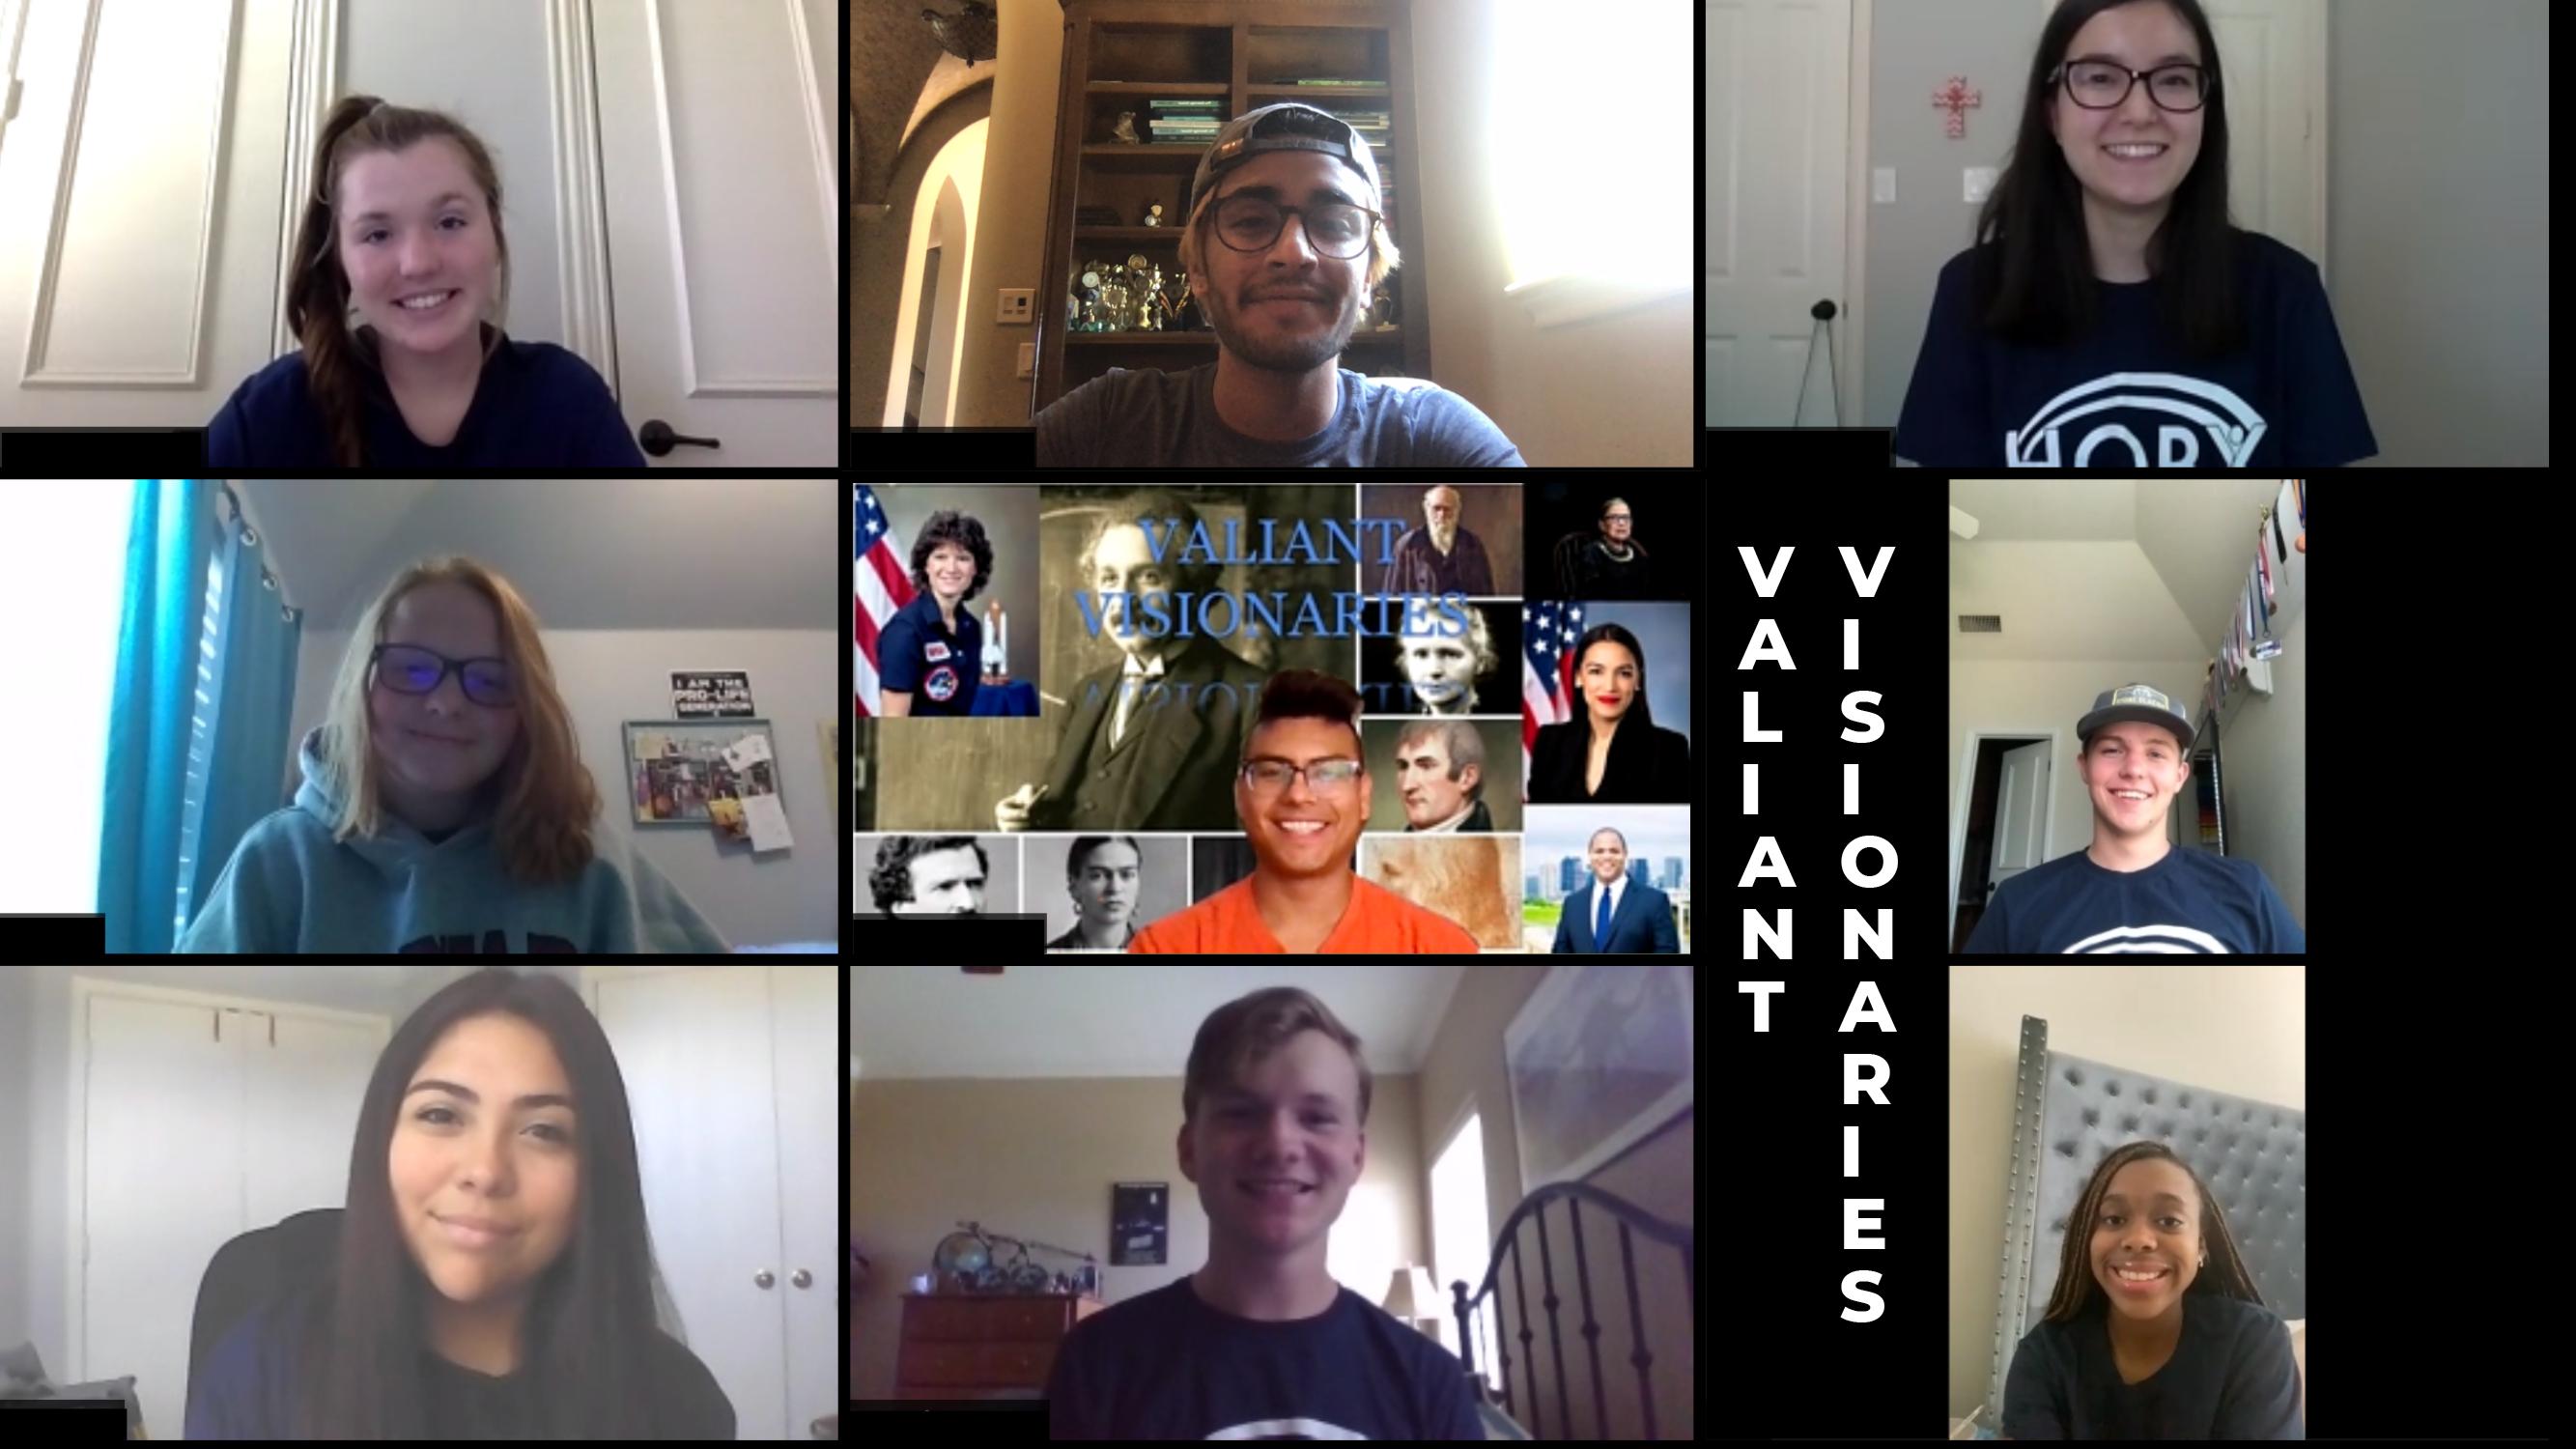 Valiant Visionaries Group